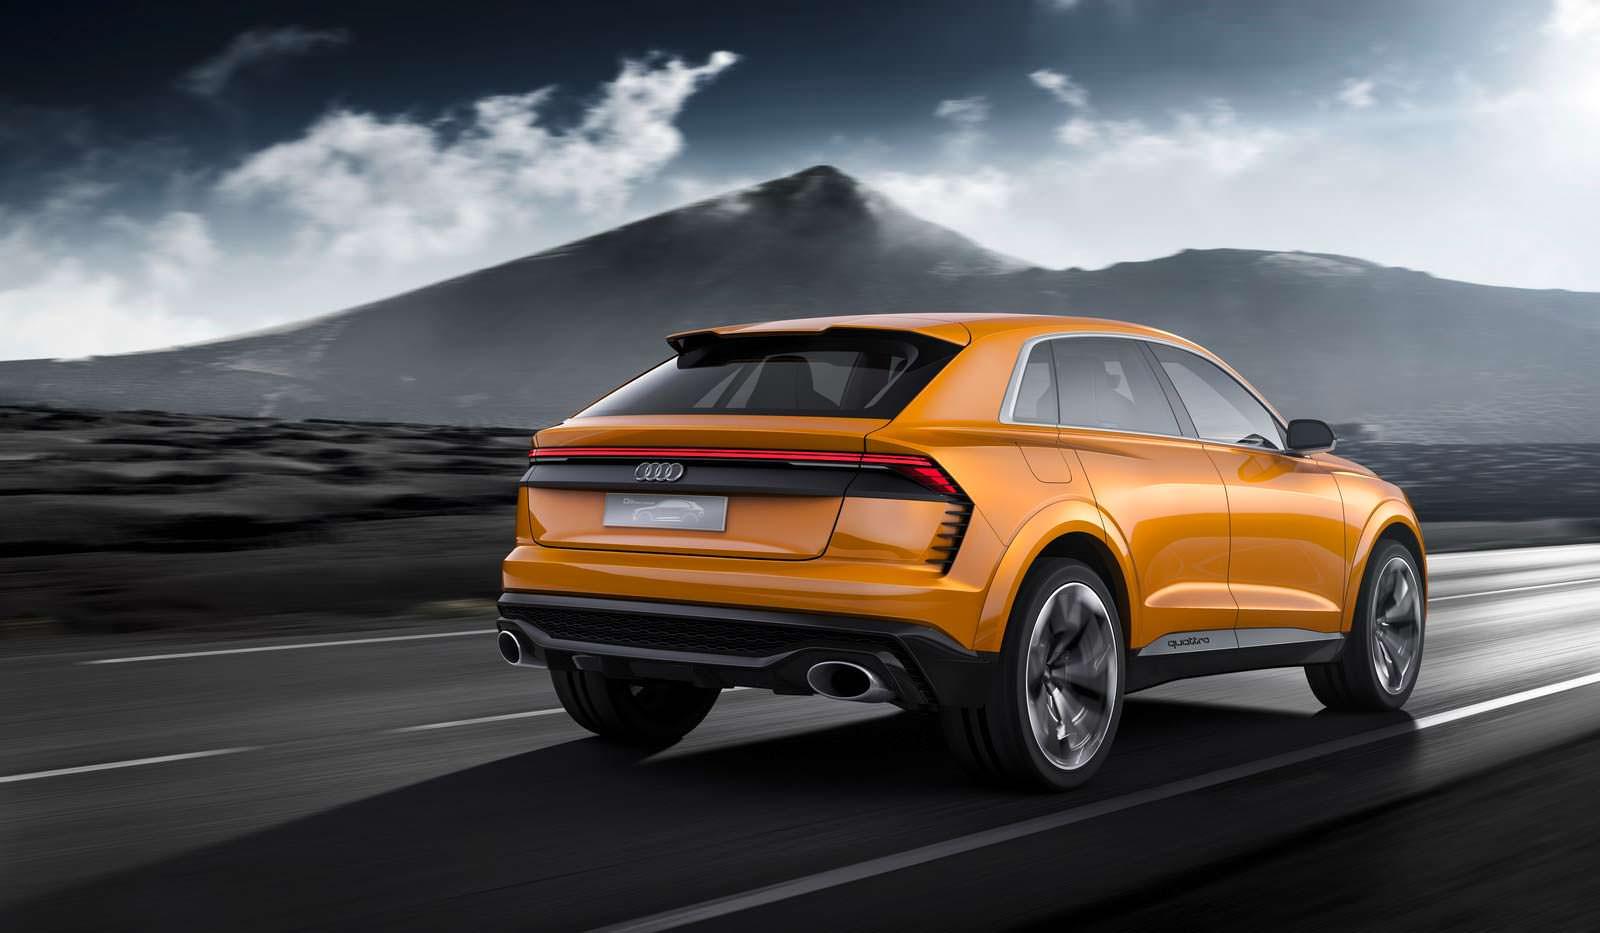 Гибридный концепт Audi Q8 Sport